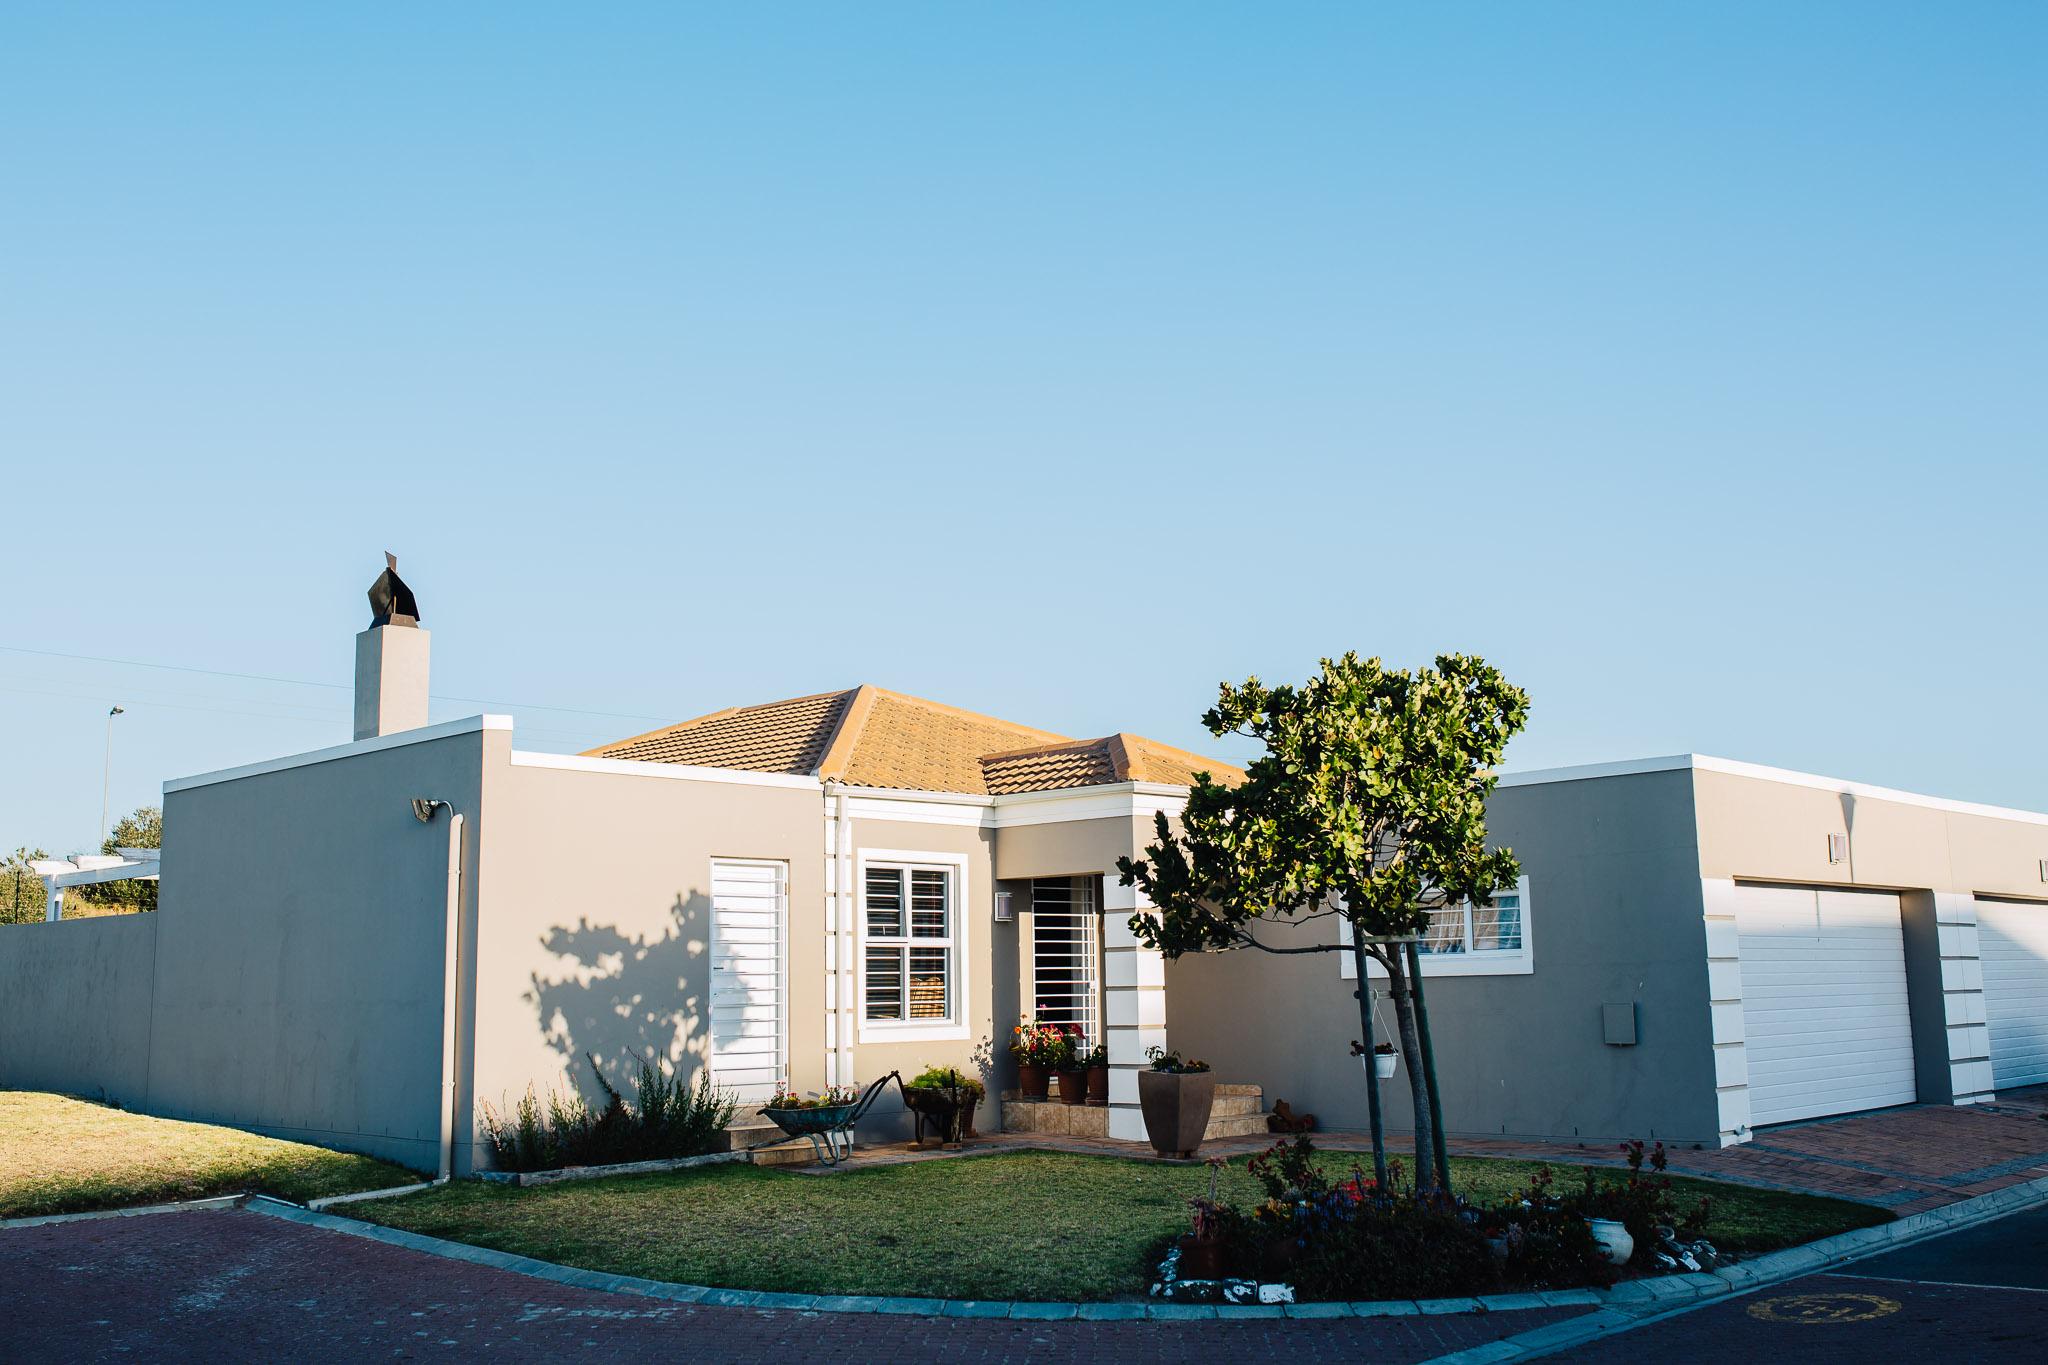 Melkbosstrand Estate Home with double garage